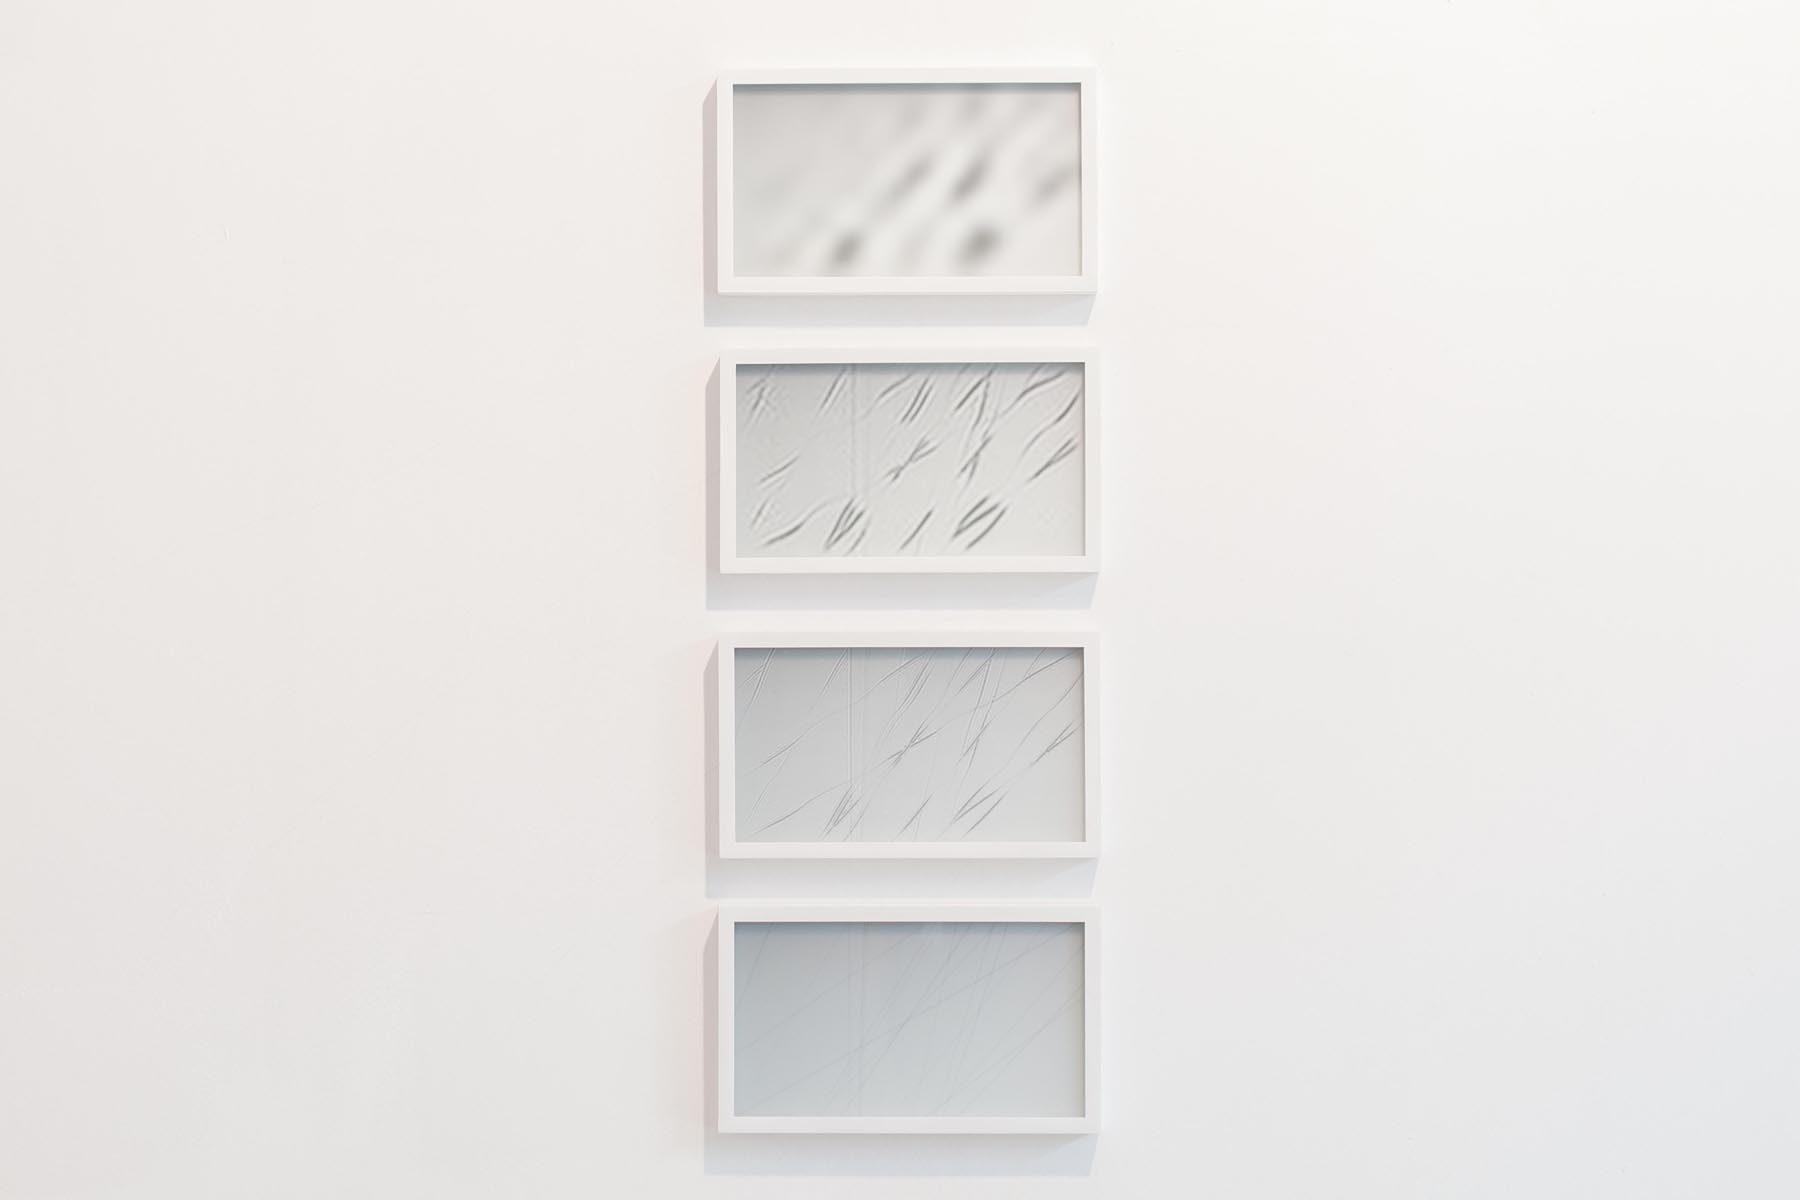 Michele Spanghero, Translucide, 2009-2017, inkjet print on paper, translucent glass, wood frame, 19 x 32 cm each